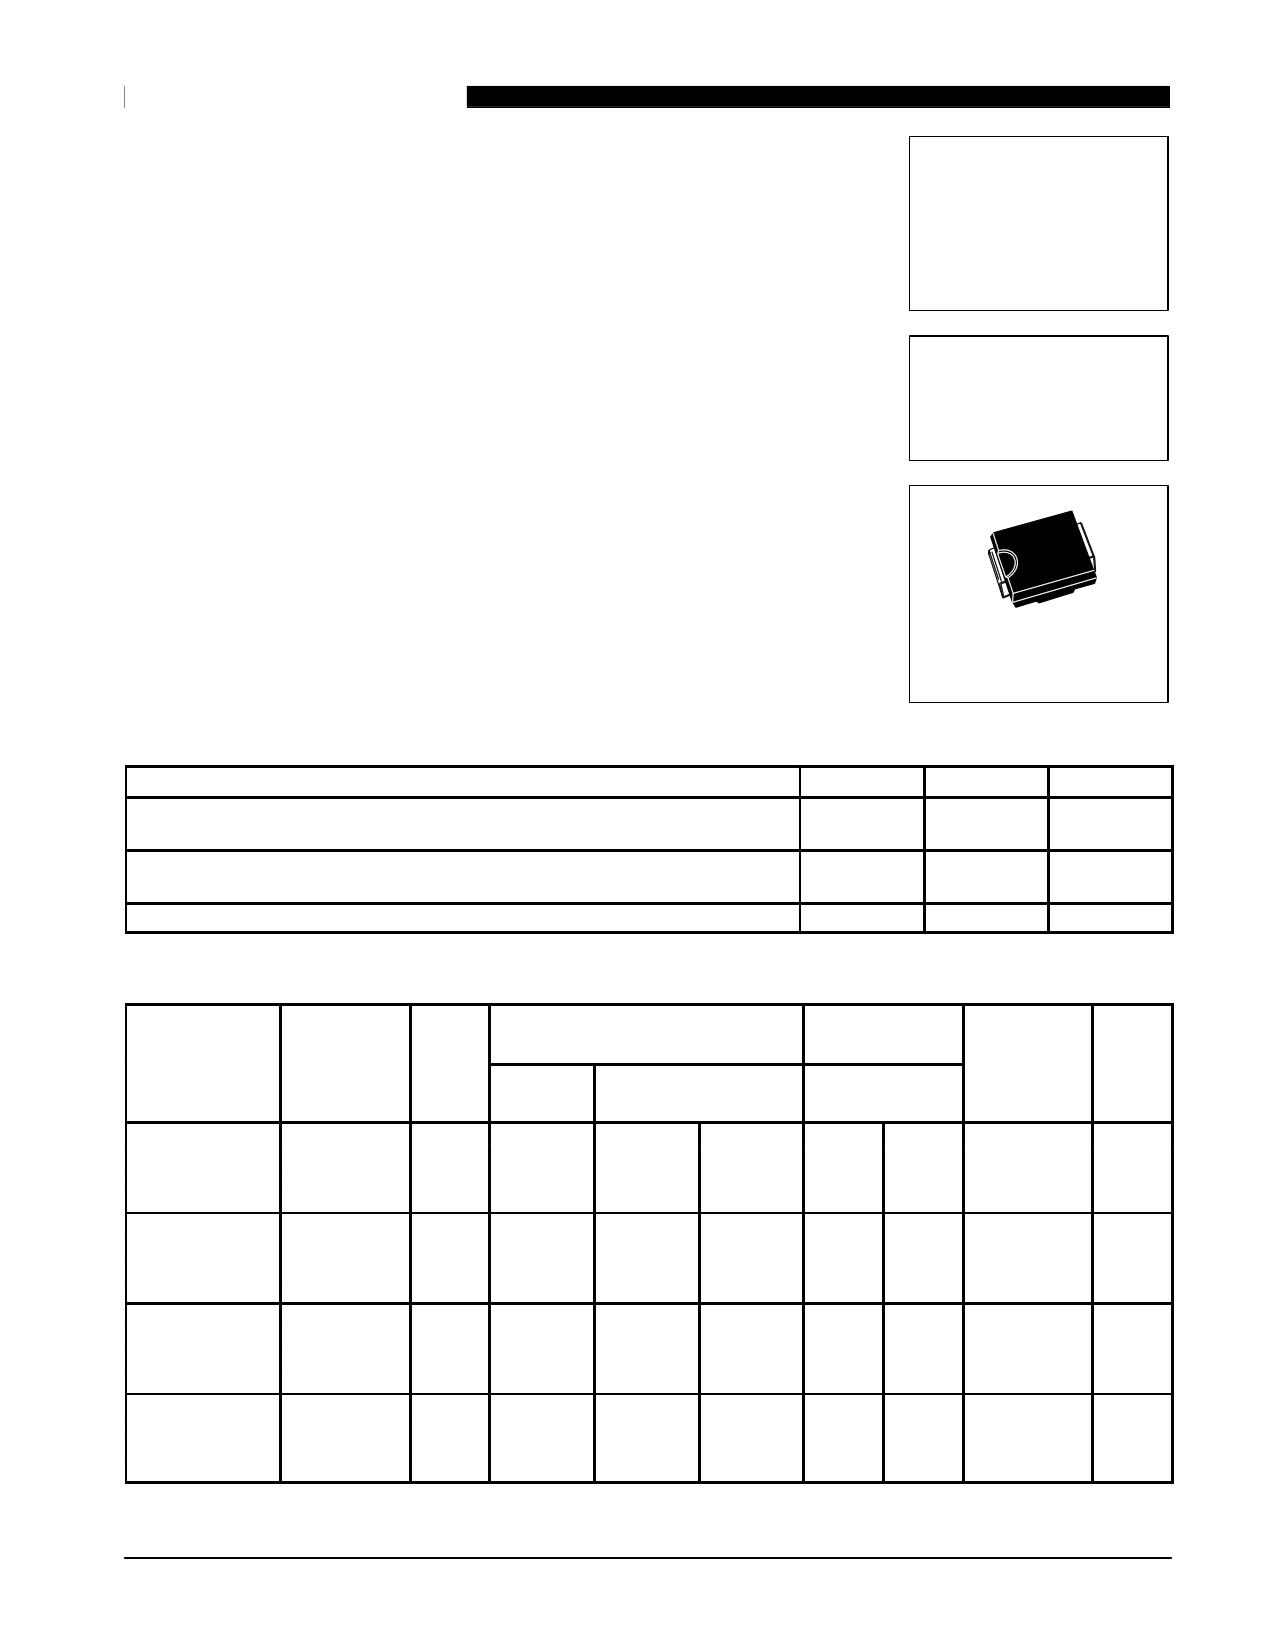 1SMB5915BT3 datasheet